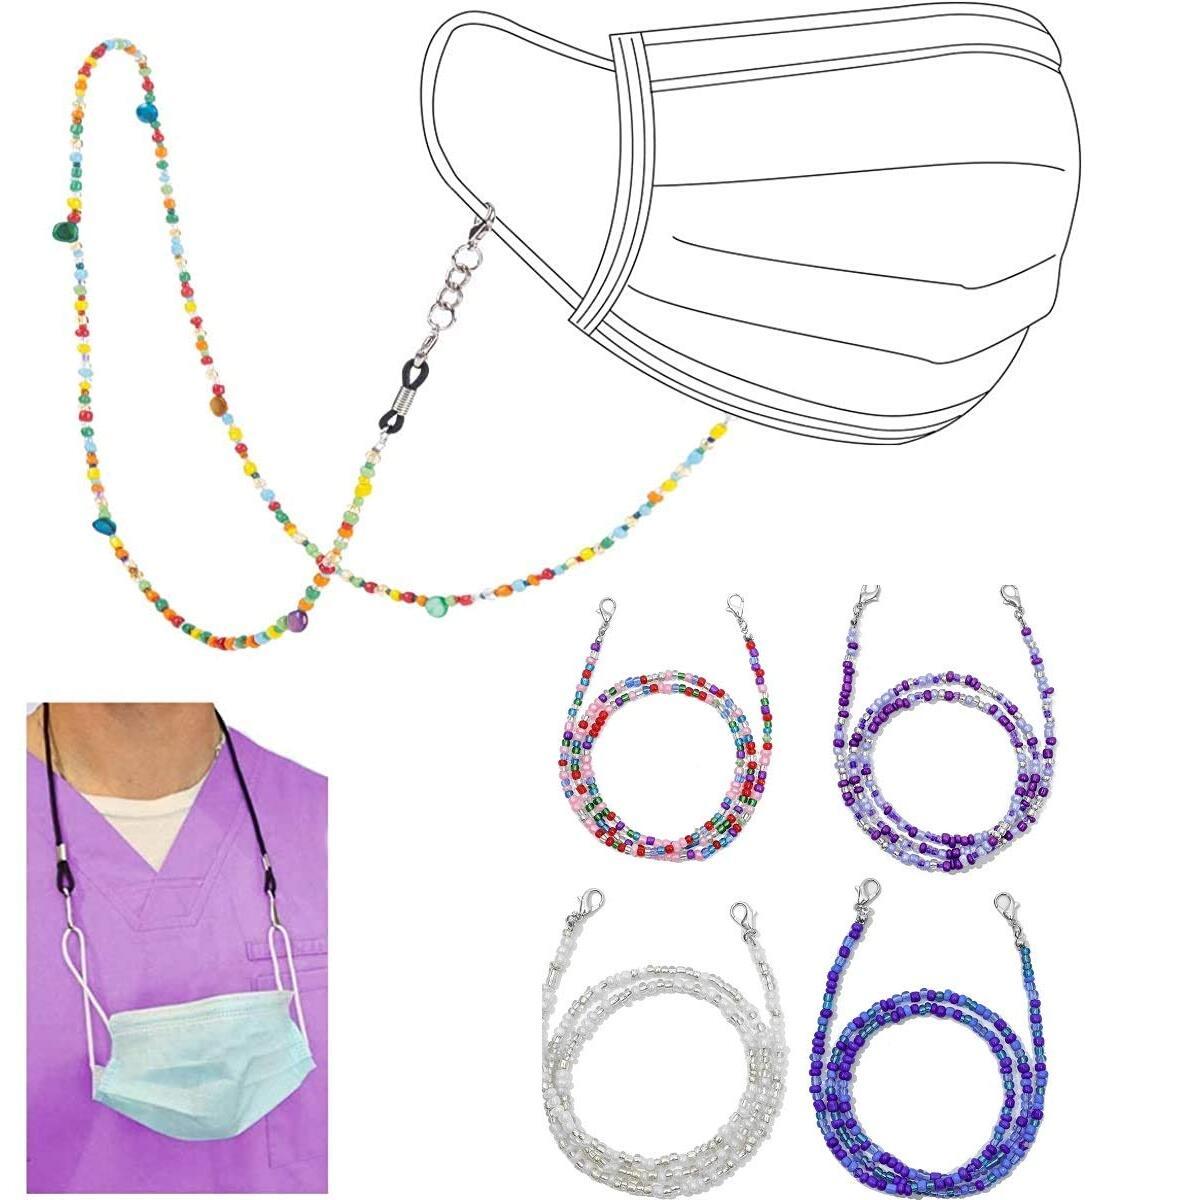 Multifunction Mask Glasses Lanyard Unisex Mask Strap,Anti-Lost Mask Leash, Suitable for Men, Women, Children, Elderly 4 Pack (Multi-4pcs)